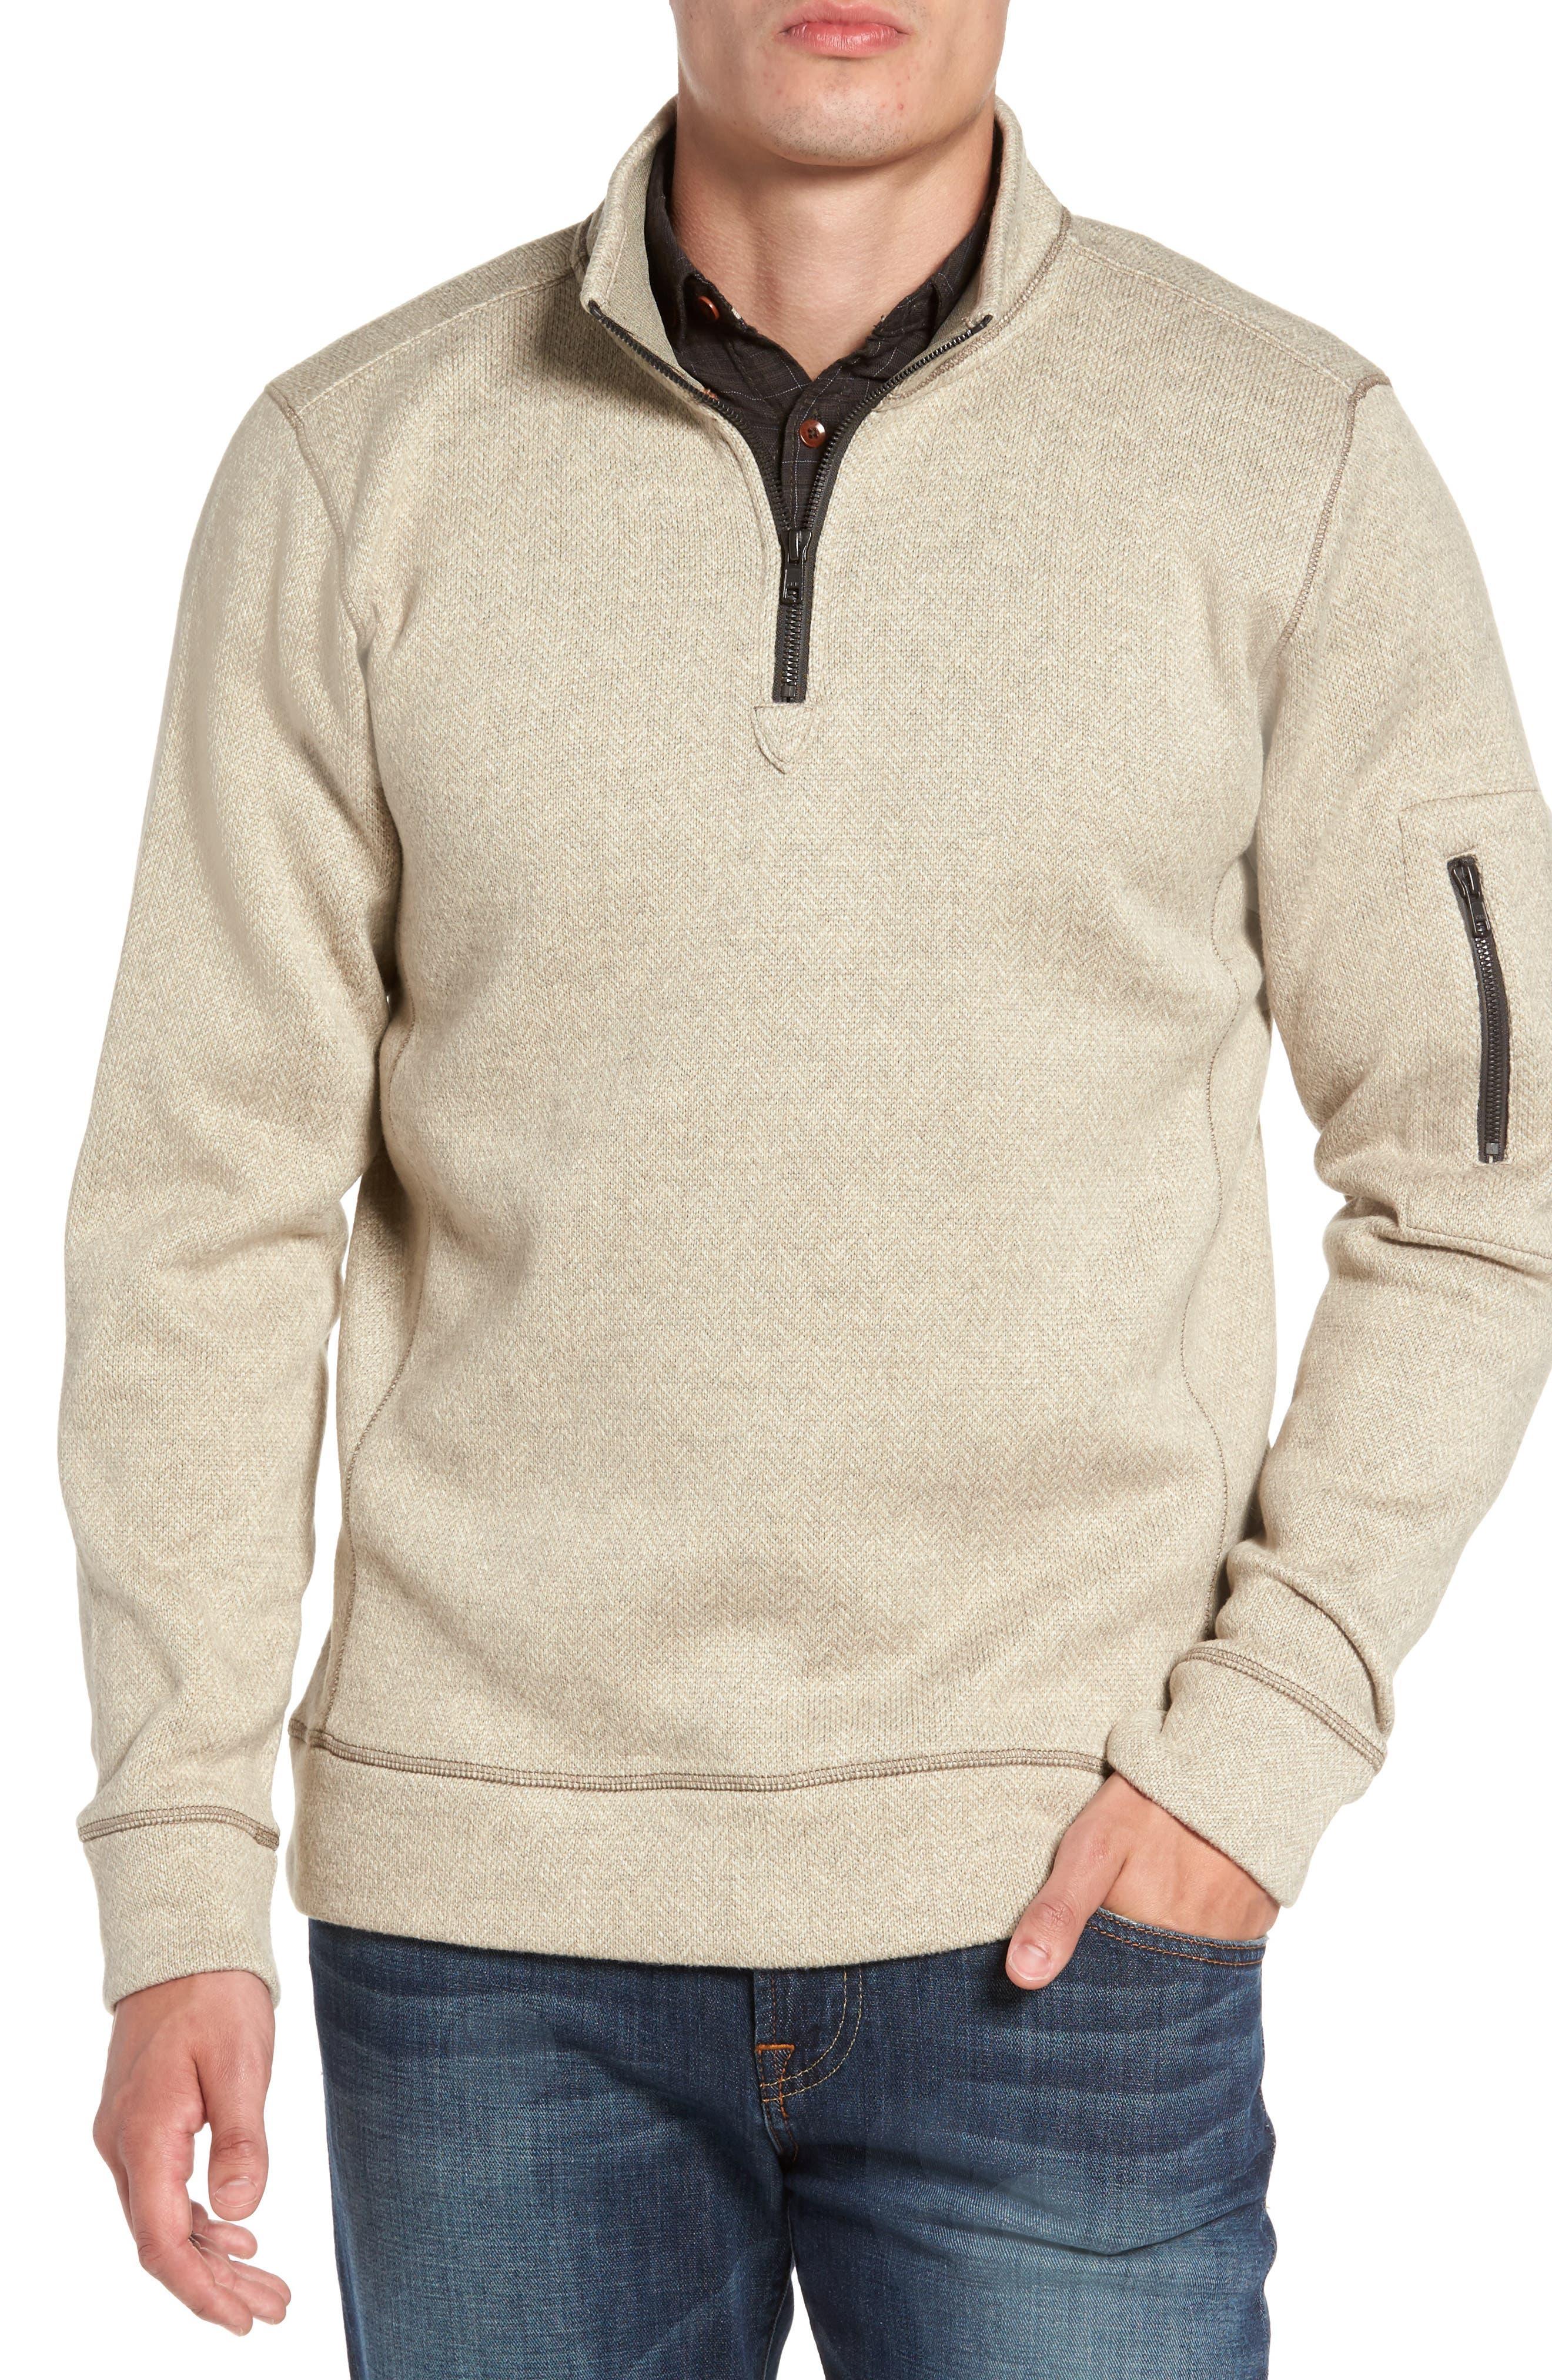 Main Image - Jeremiah Lance Herringbone Zip Mock Neck Sweater